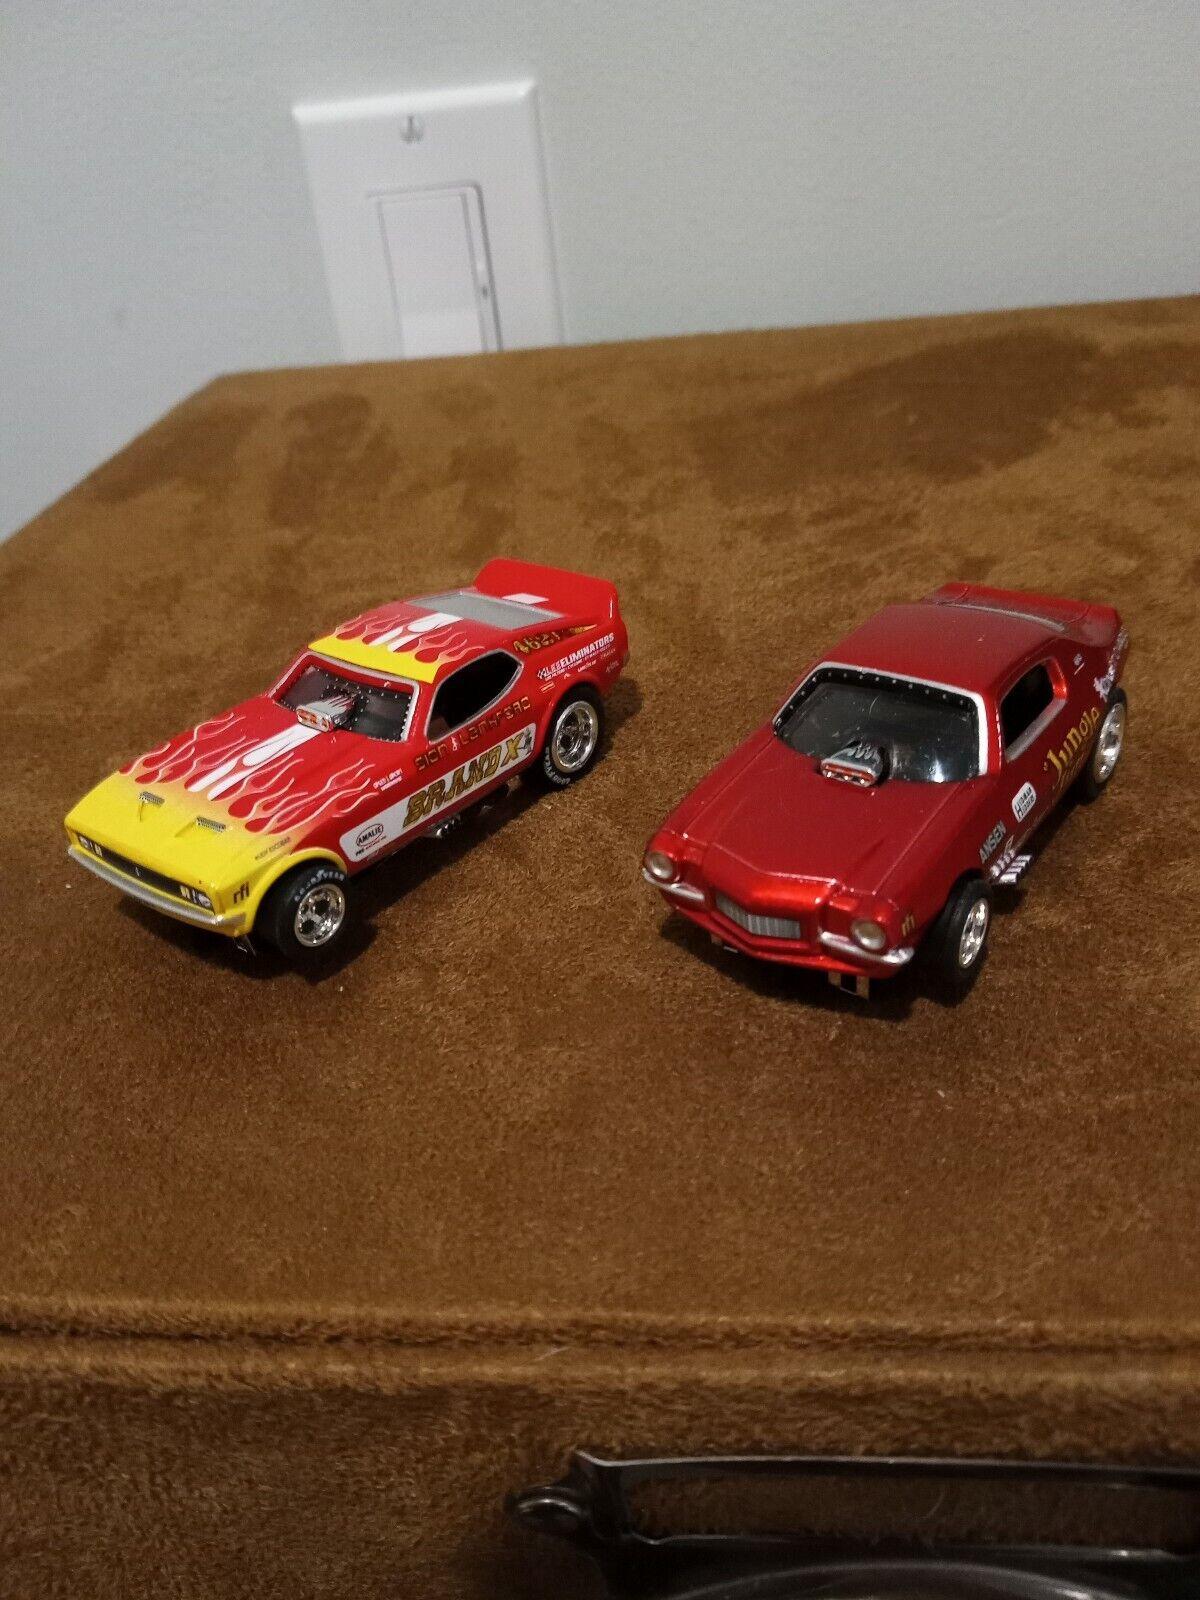 AFX Drôle Voiture Slotcar voitures